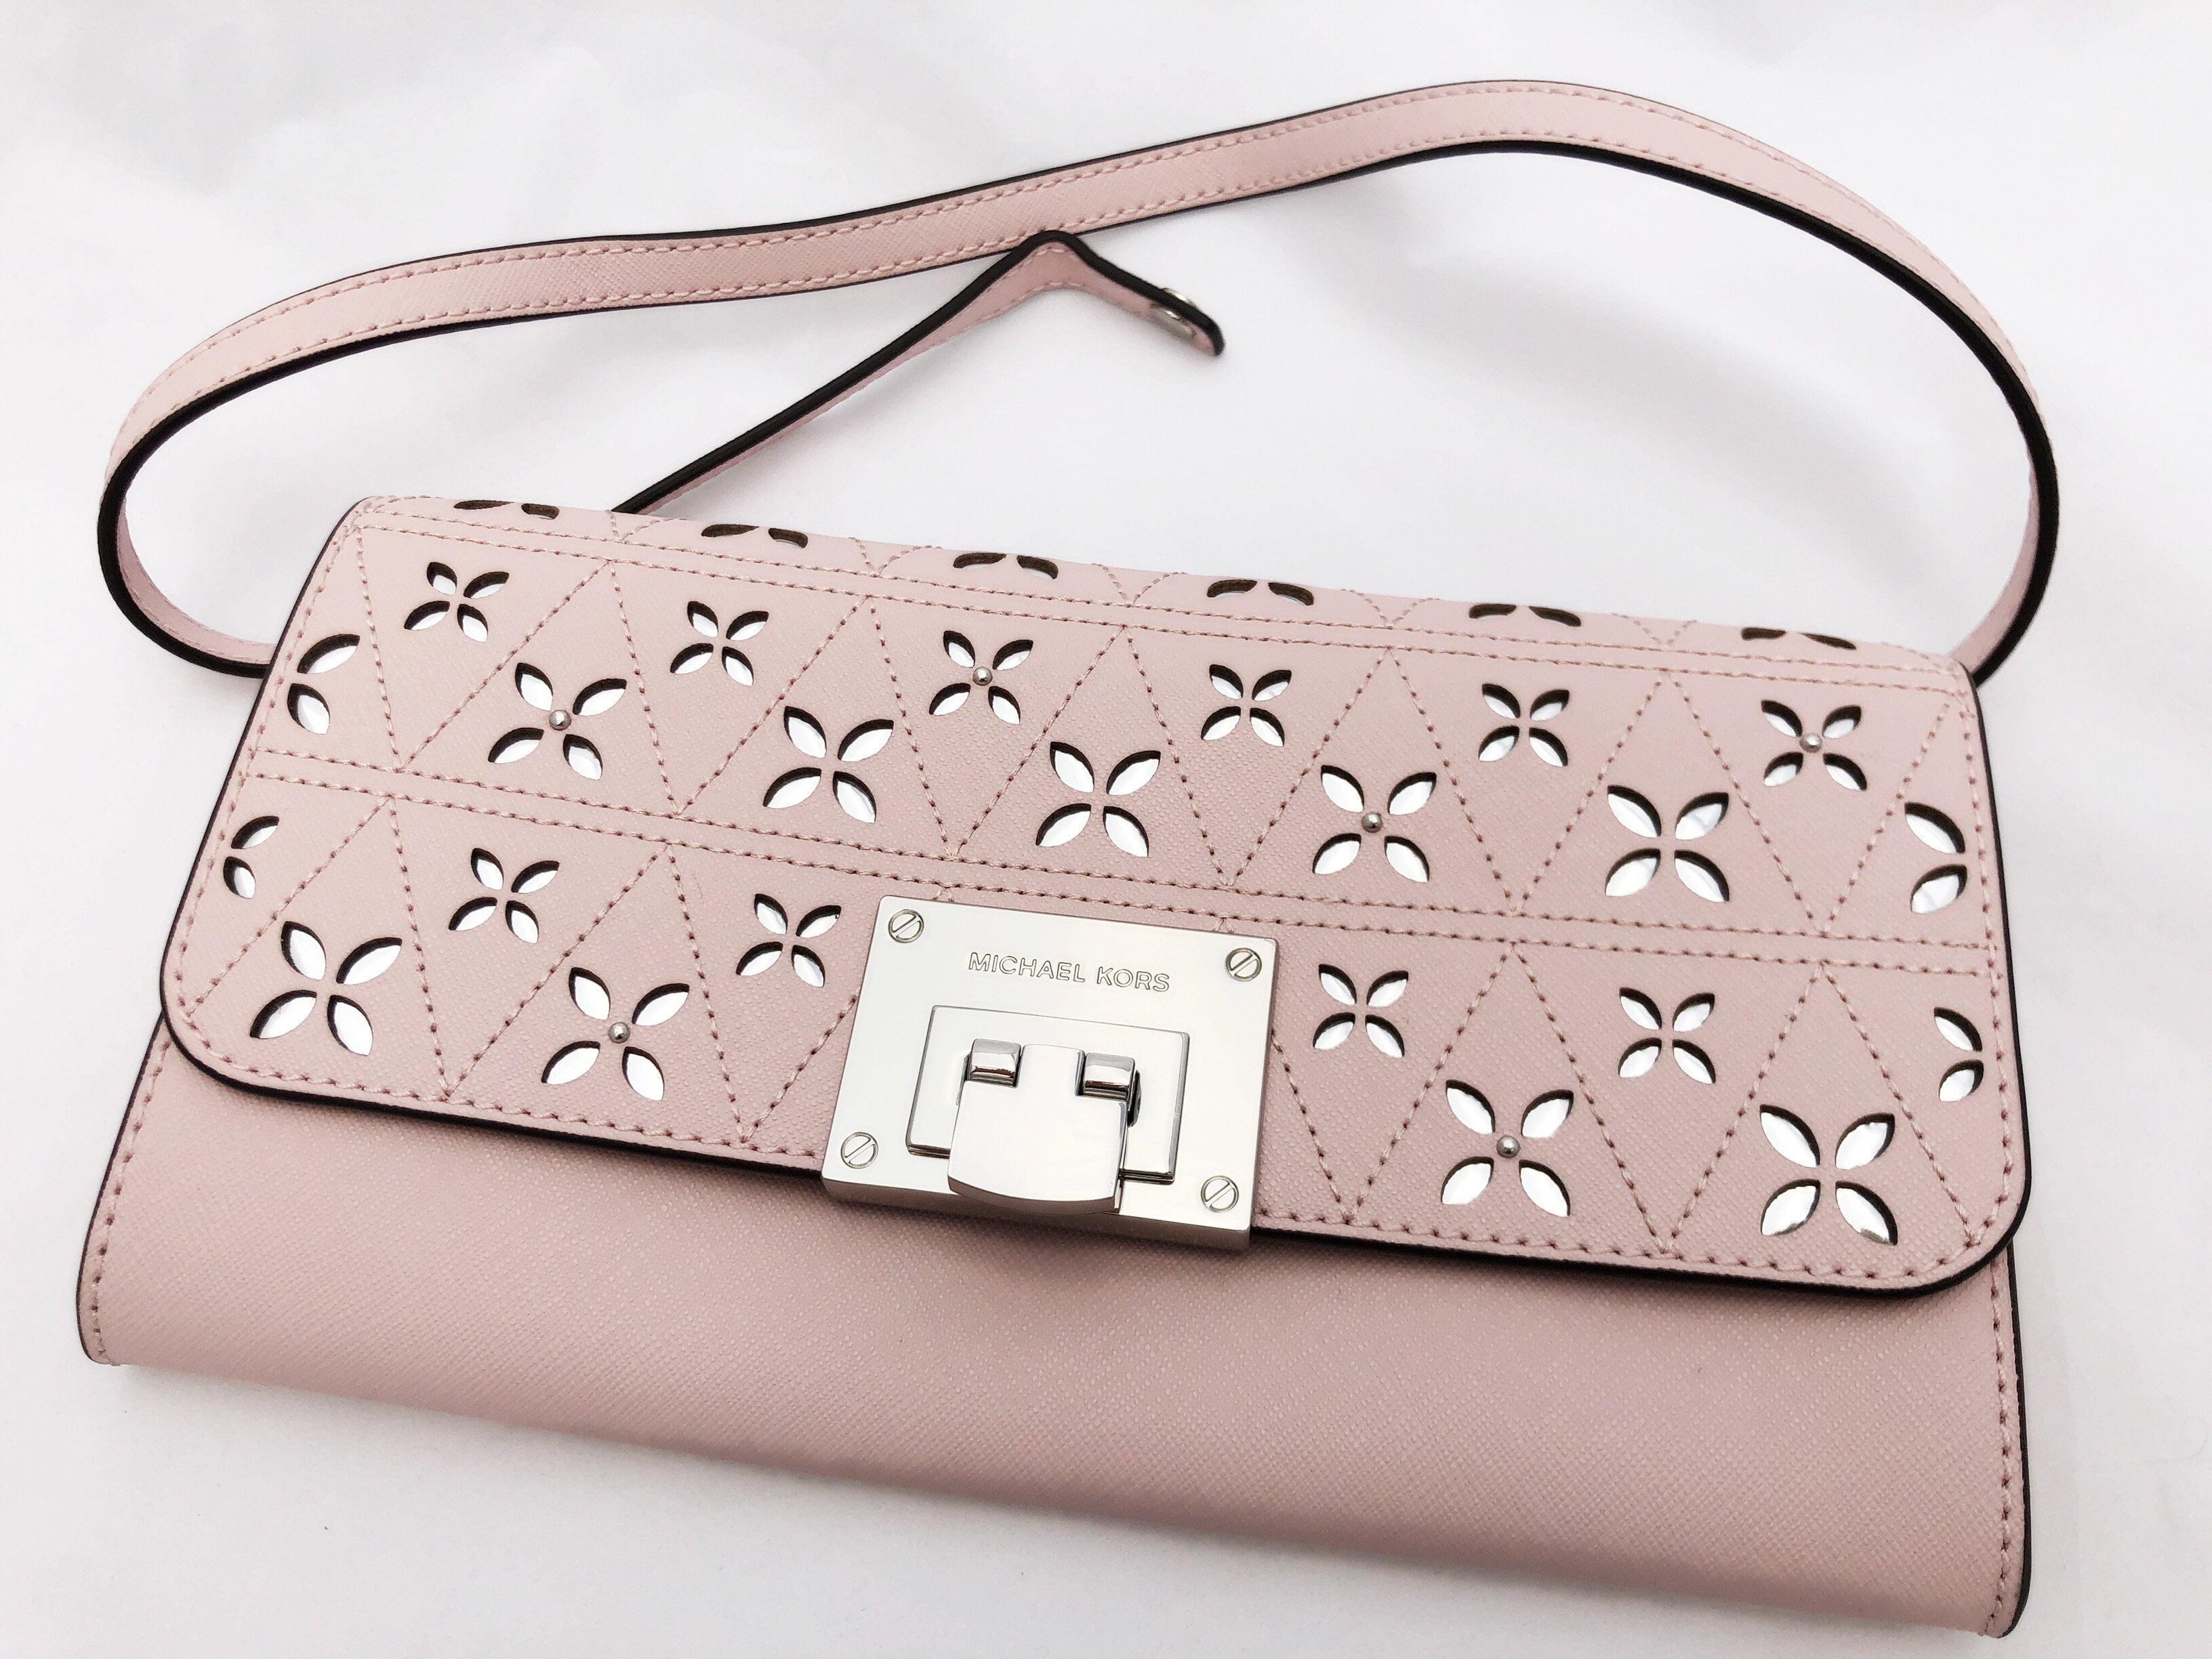 28f0e22cbcc3 Michael Kors Tina Clutch Perforated Blossom Pink Shoulder Bag - Walmart.com